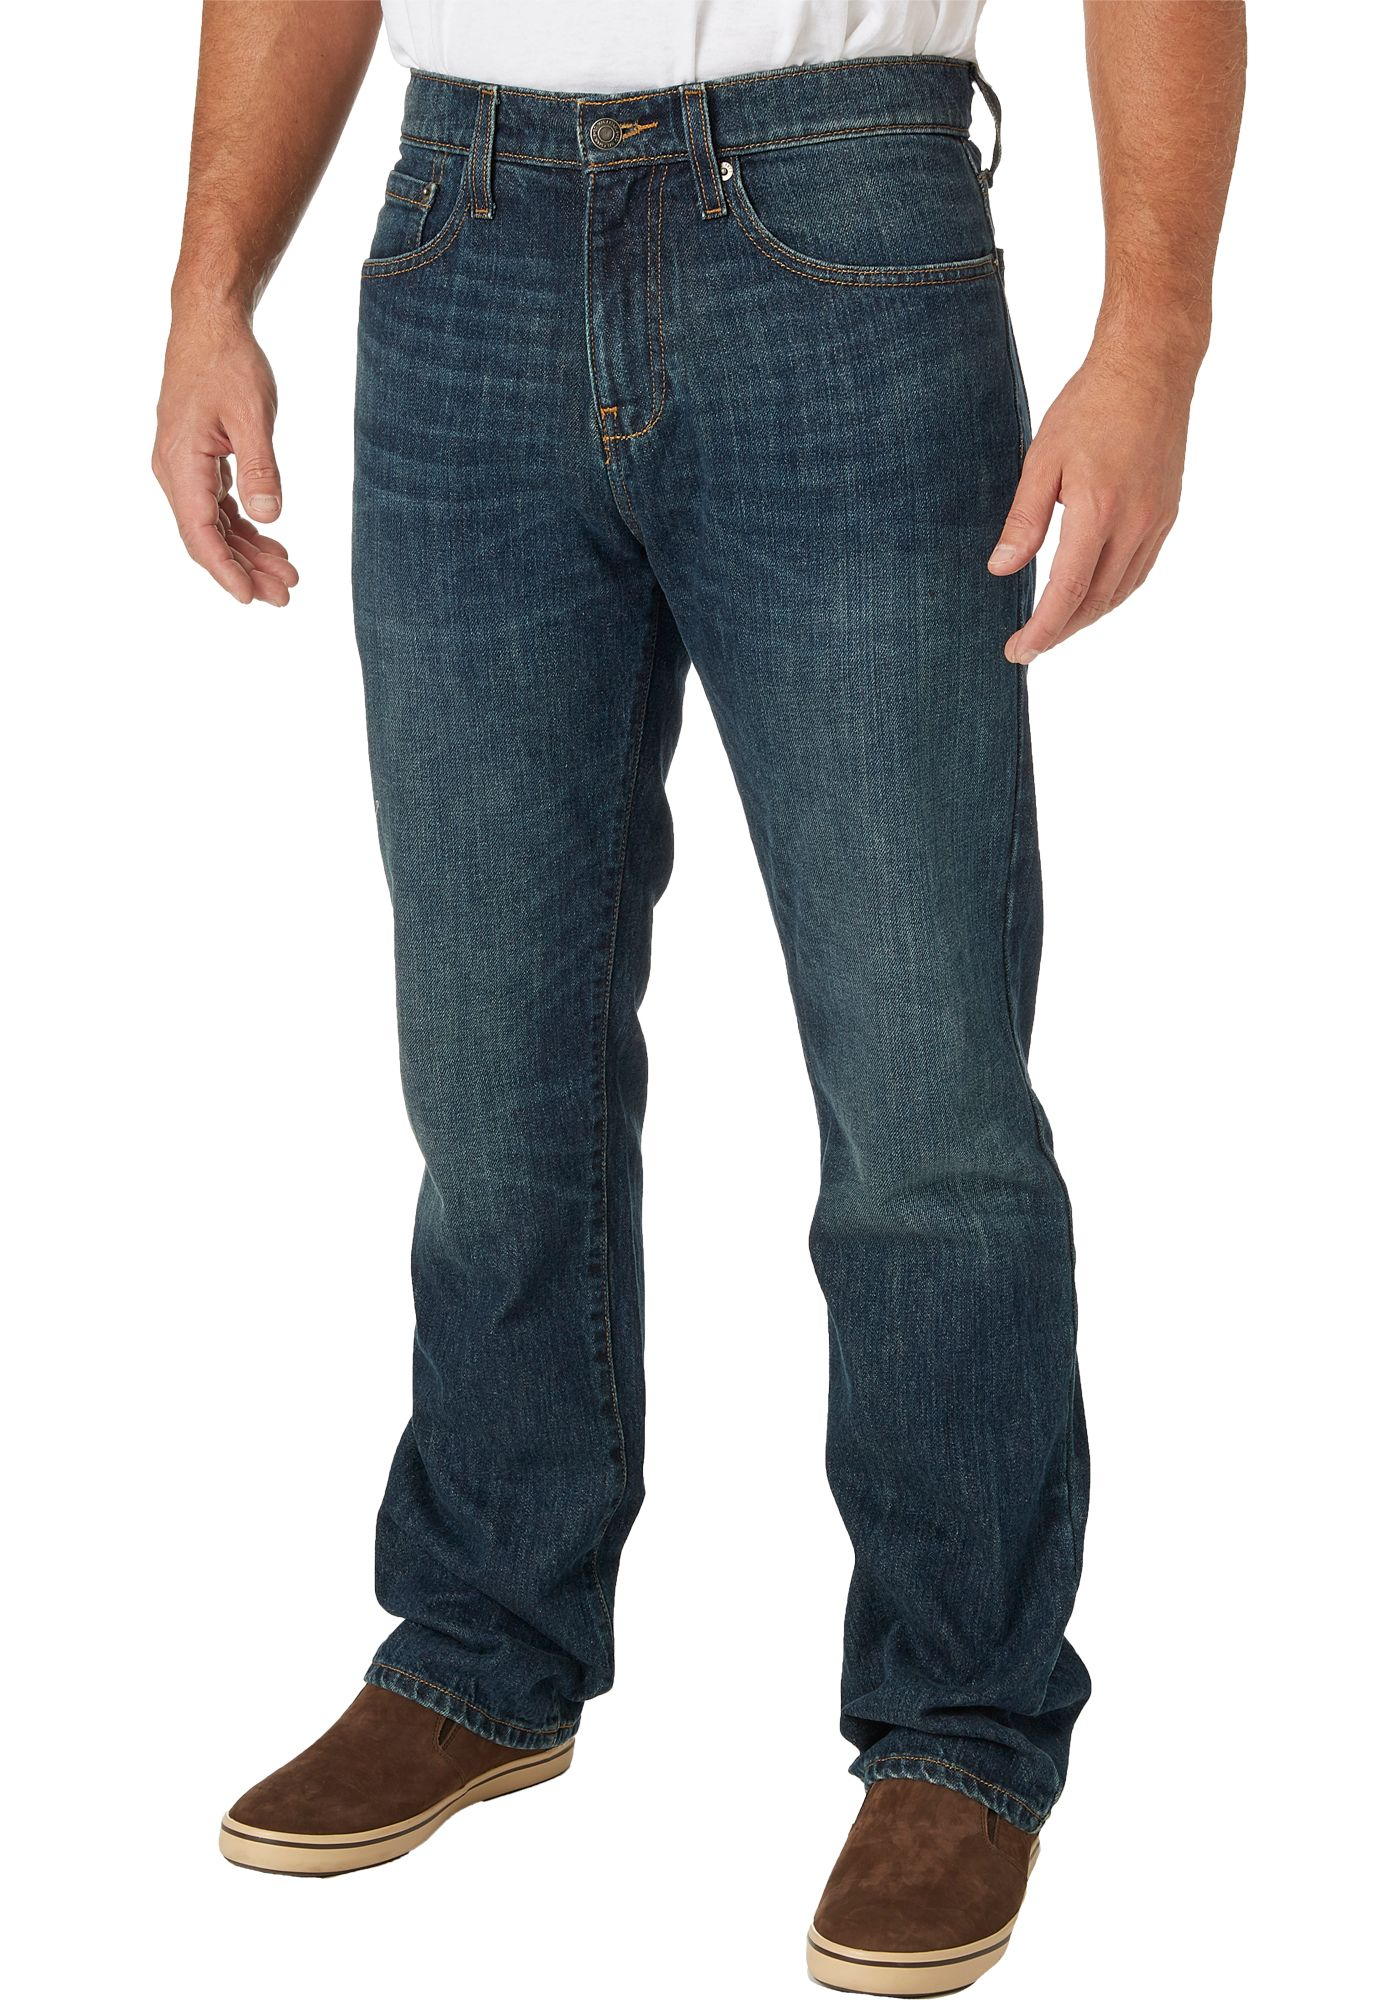 Field & Stream Men's Straight Denim Jeans